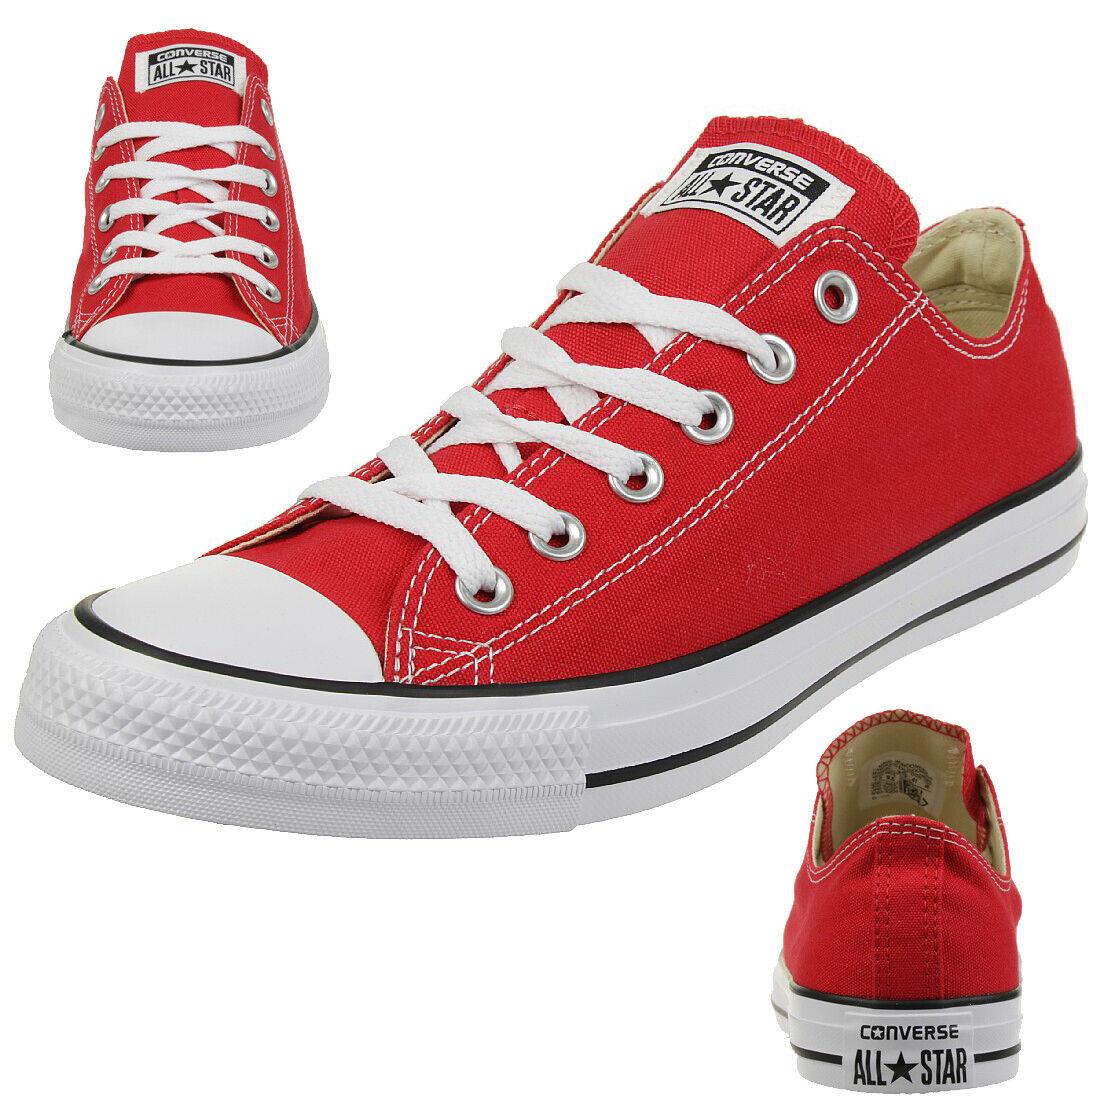 Converse All Star Bœuf Chuck Chaussures paniers en Toile Rouge M9696C